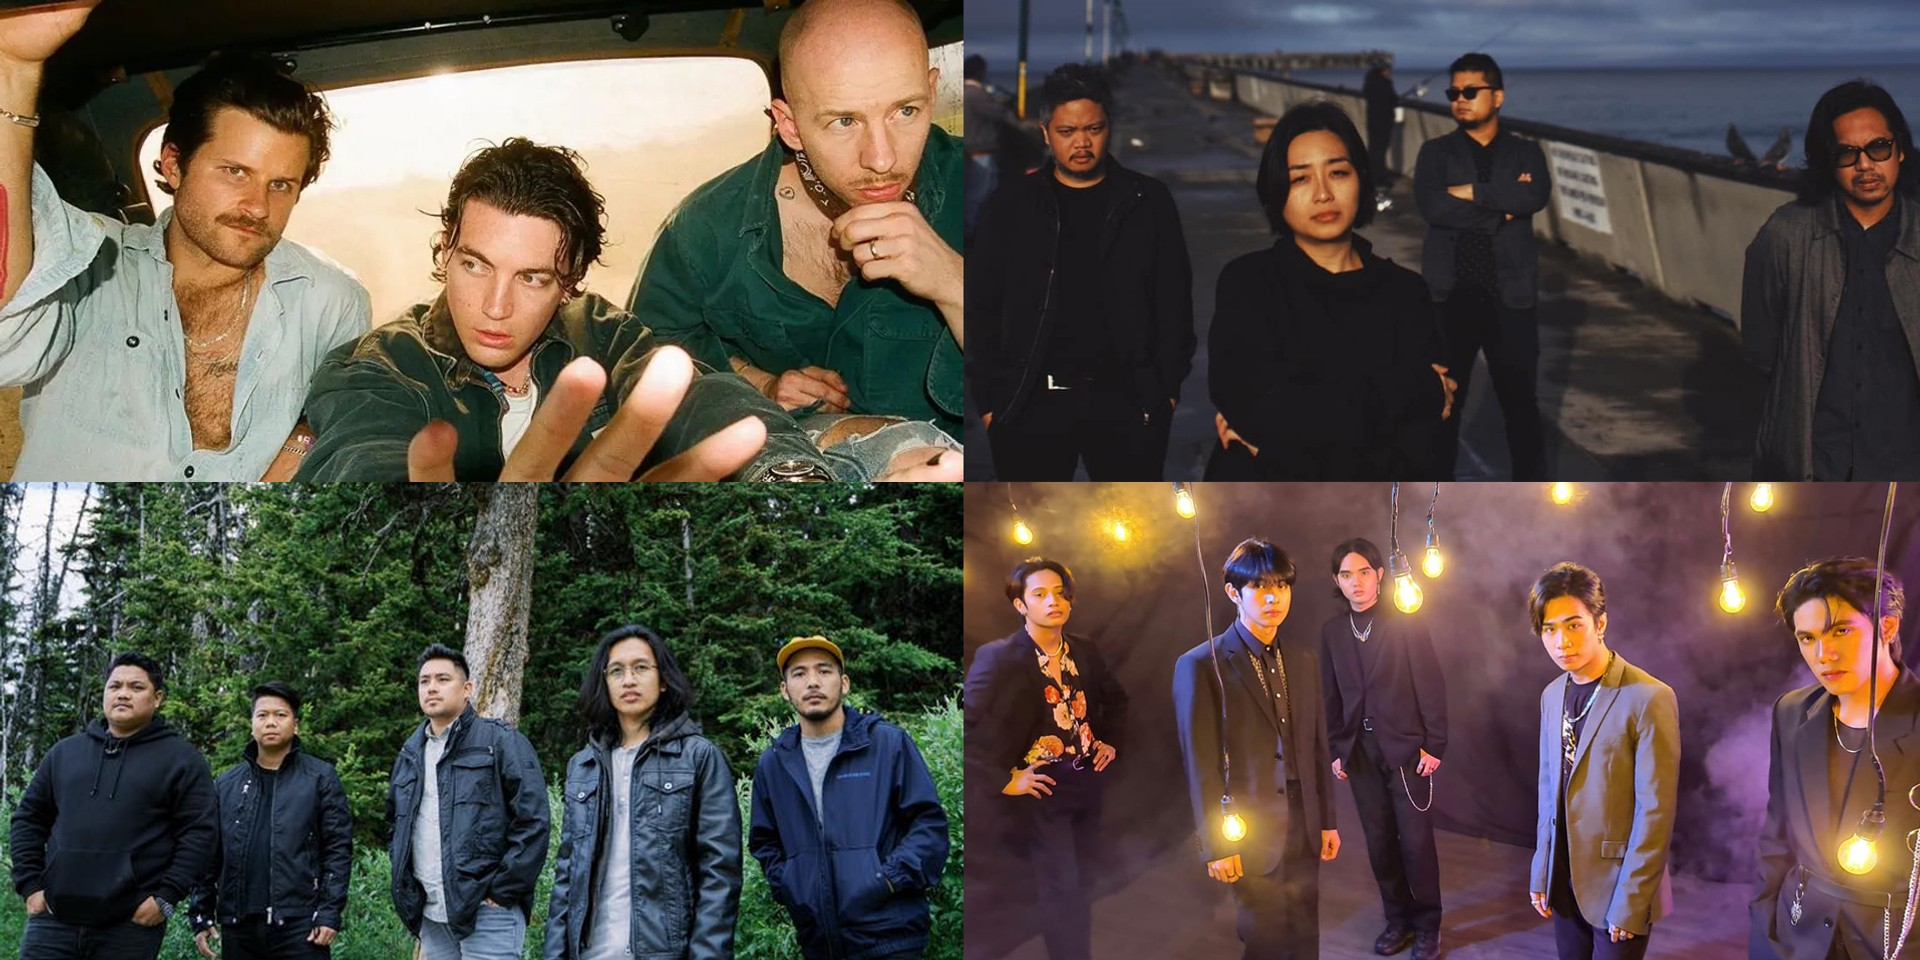 LANY, Ben&Ben, SB19, December Avenue, UDD, and more to perform at G Music Fest digital concert